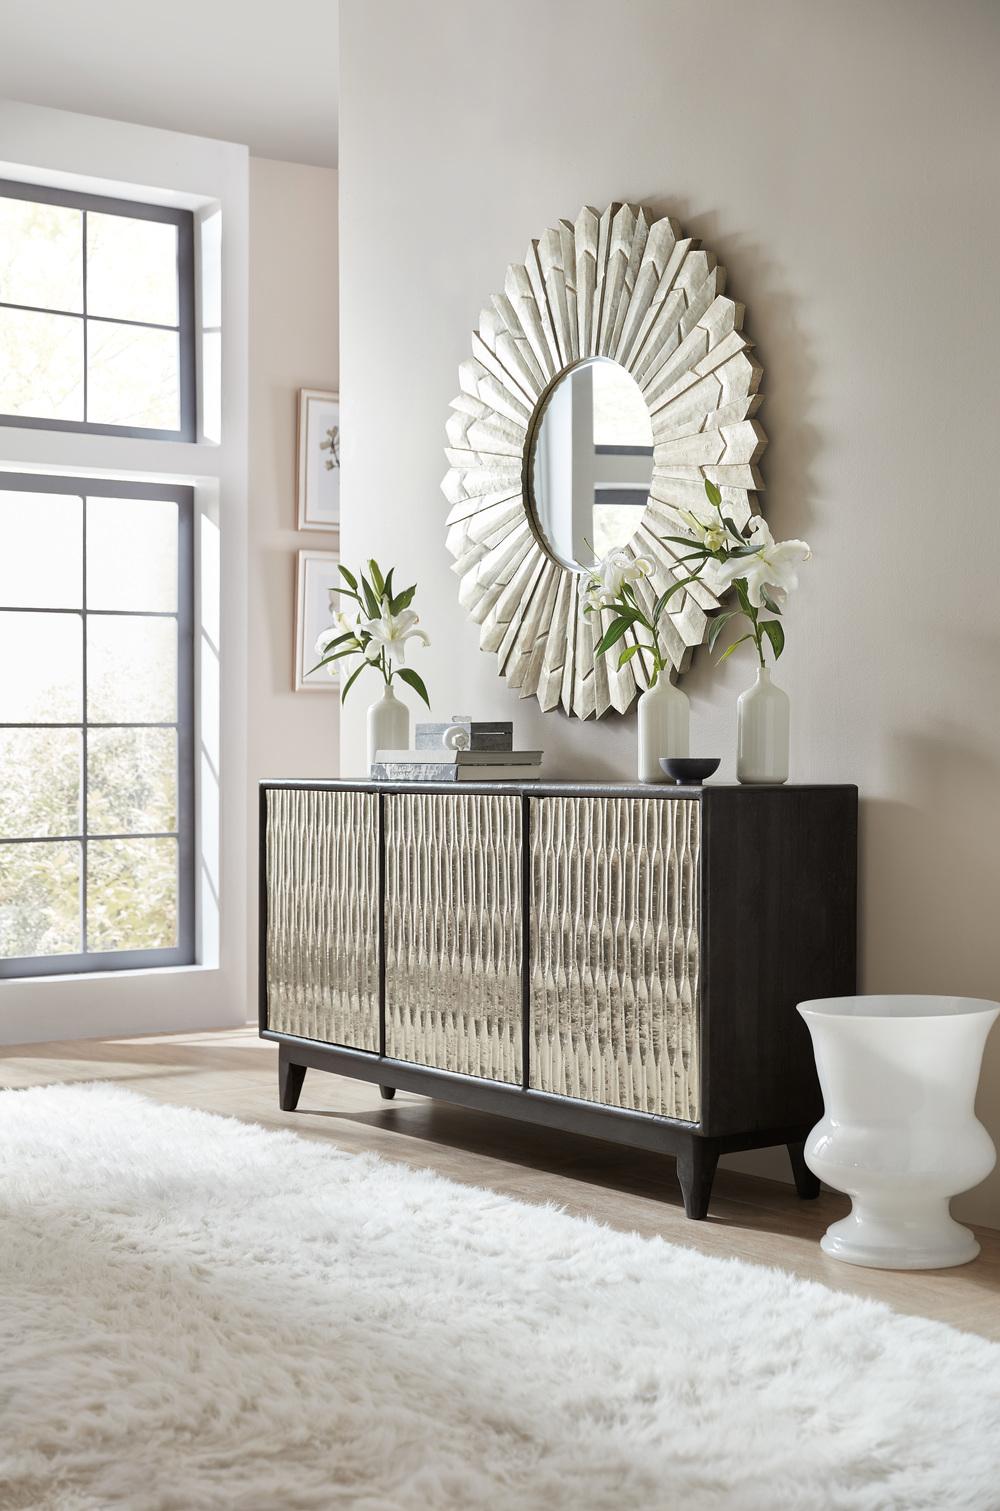 Hooker Furniture - Shimmer Three Door Credenza